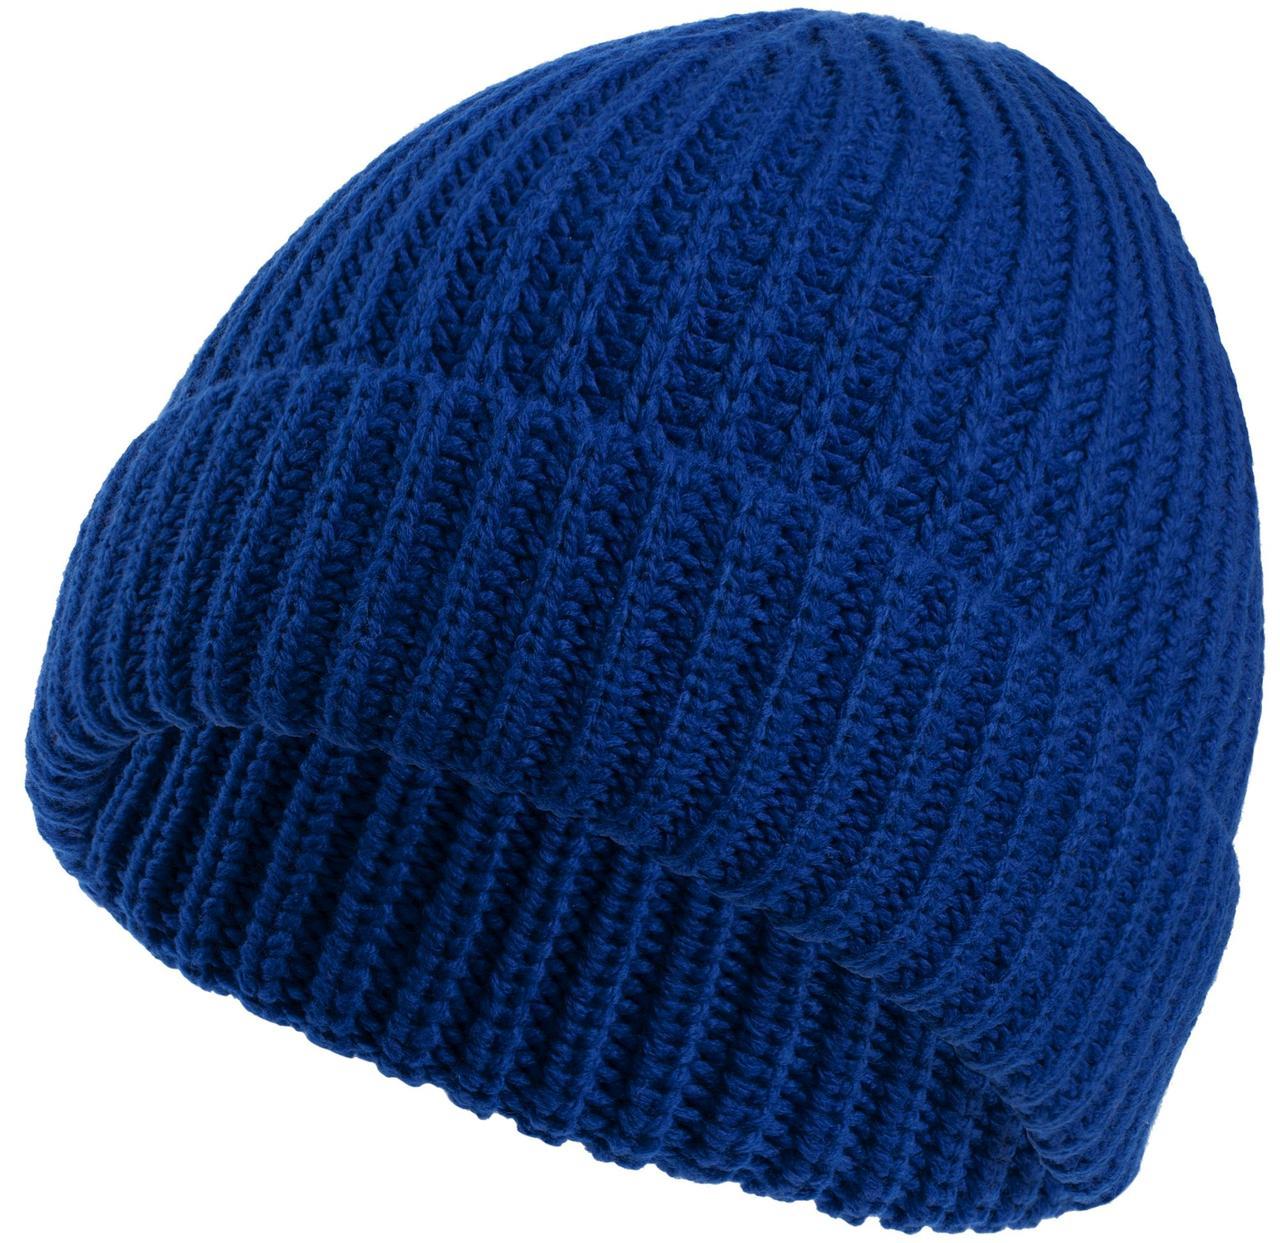 Шапка Nordkapp, синяя (артикул 14401.44)